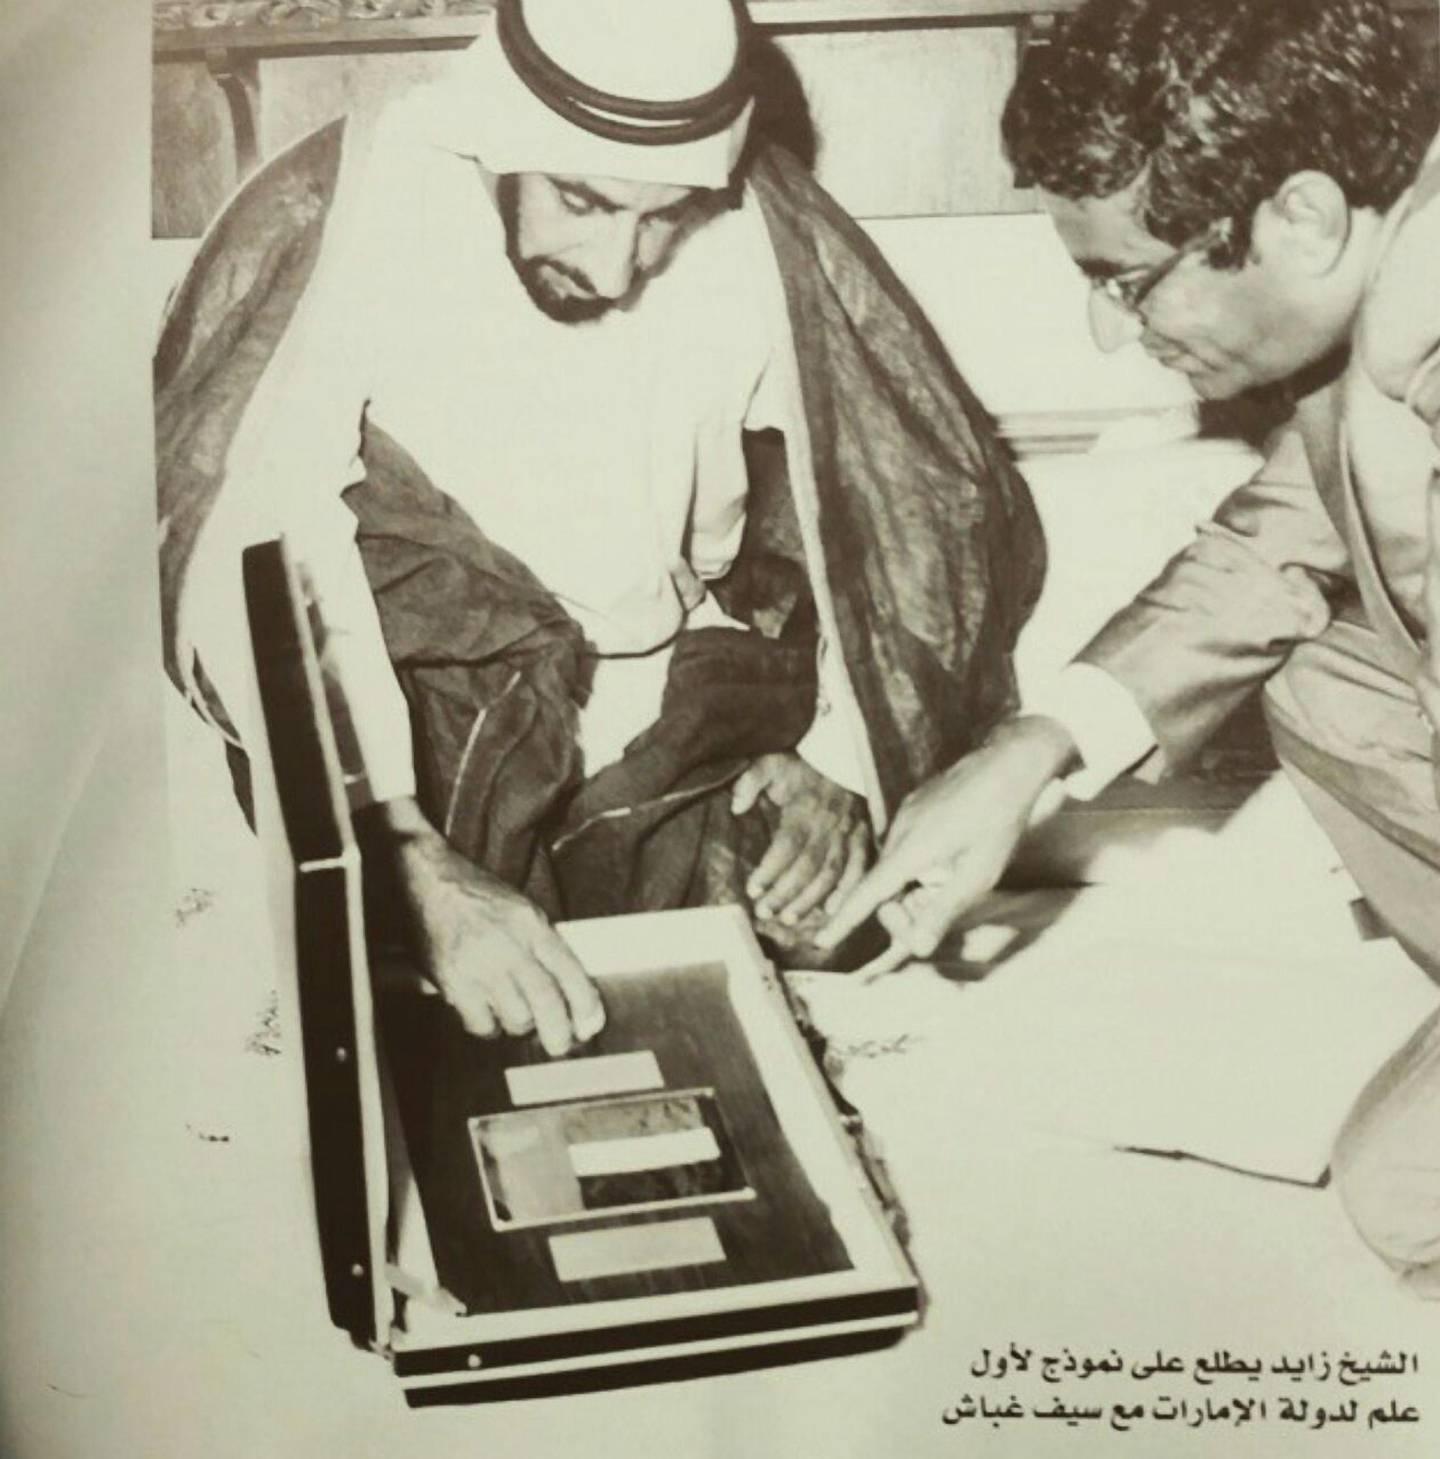 Provided photo of Sheikh Zayed  and Saif Ghobash views the first representation of the UAE flag,   Courtesy Hamdan Al Maainah  *** Local Caption ***  2016-11-02-PHOTO-00000012.jpg